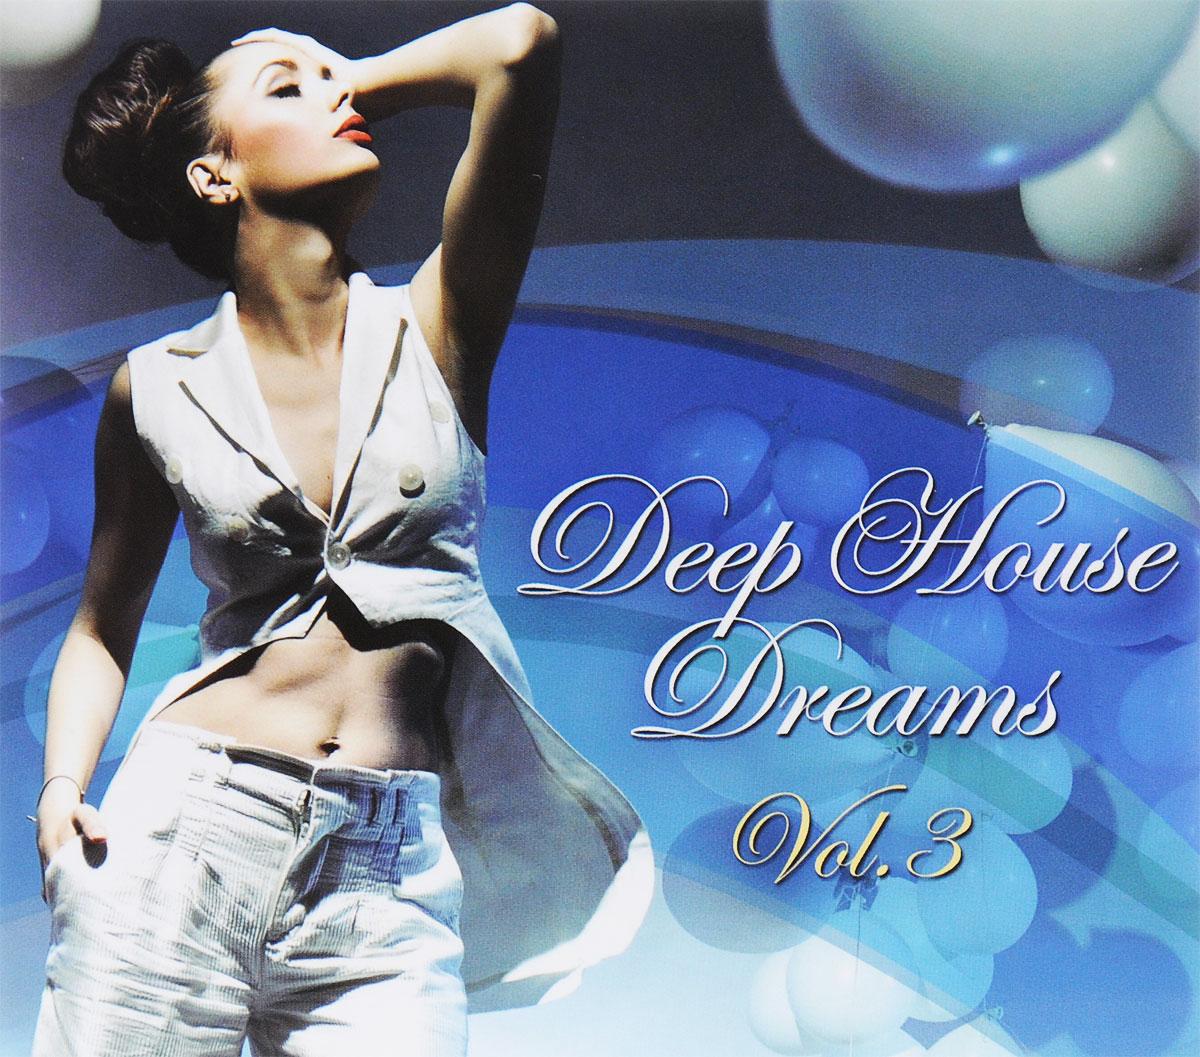 Deep House Dreams. Vol. 3 (2 CD) 2015 2 Audio CD